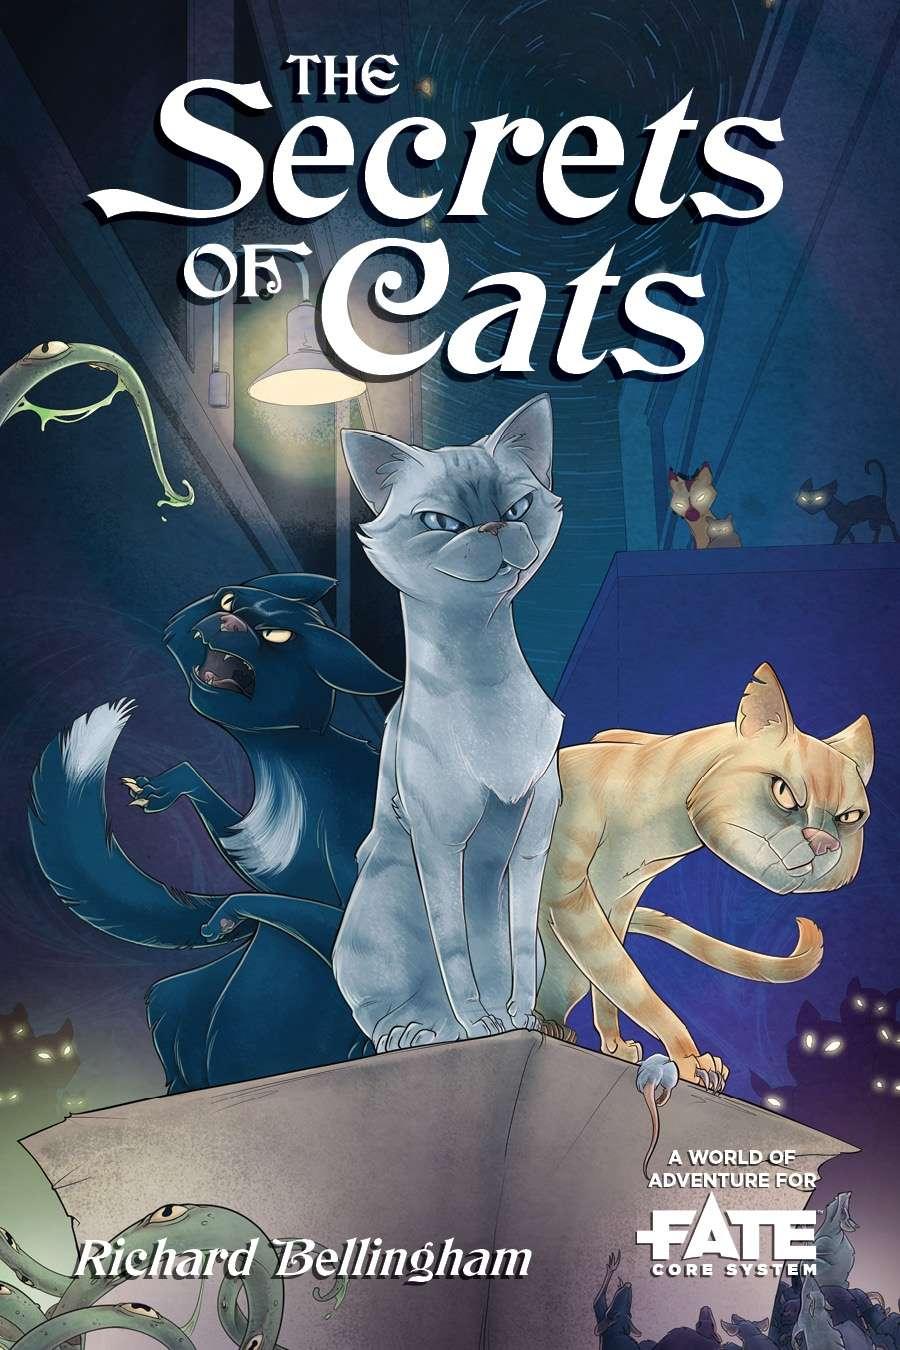 The Secrets of Cats 고양이의 비밀